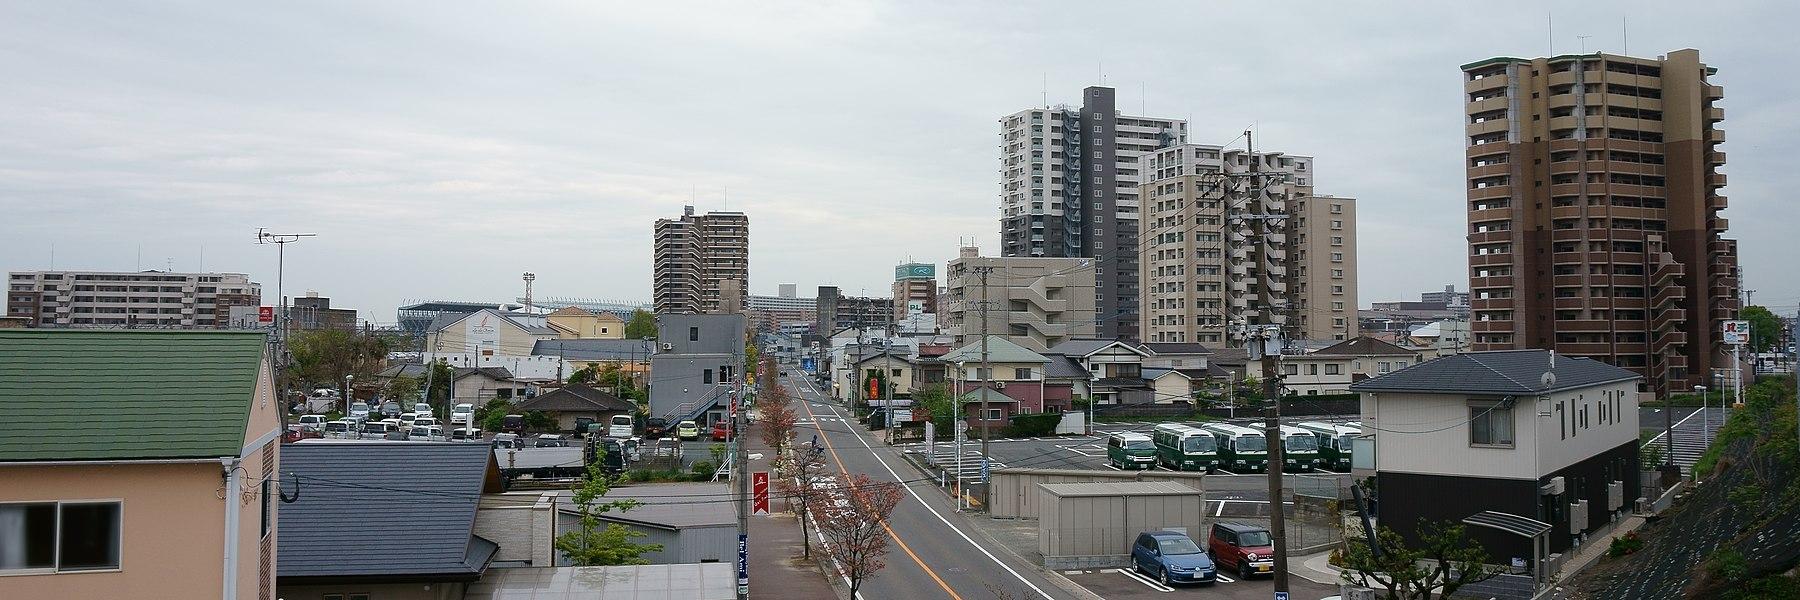 Cityscape around Tosu station 2017.jpg